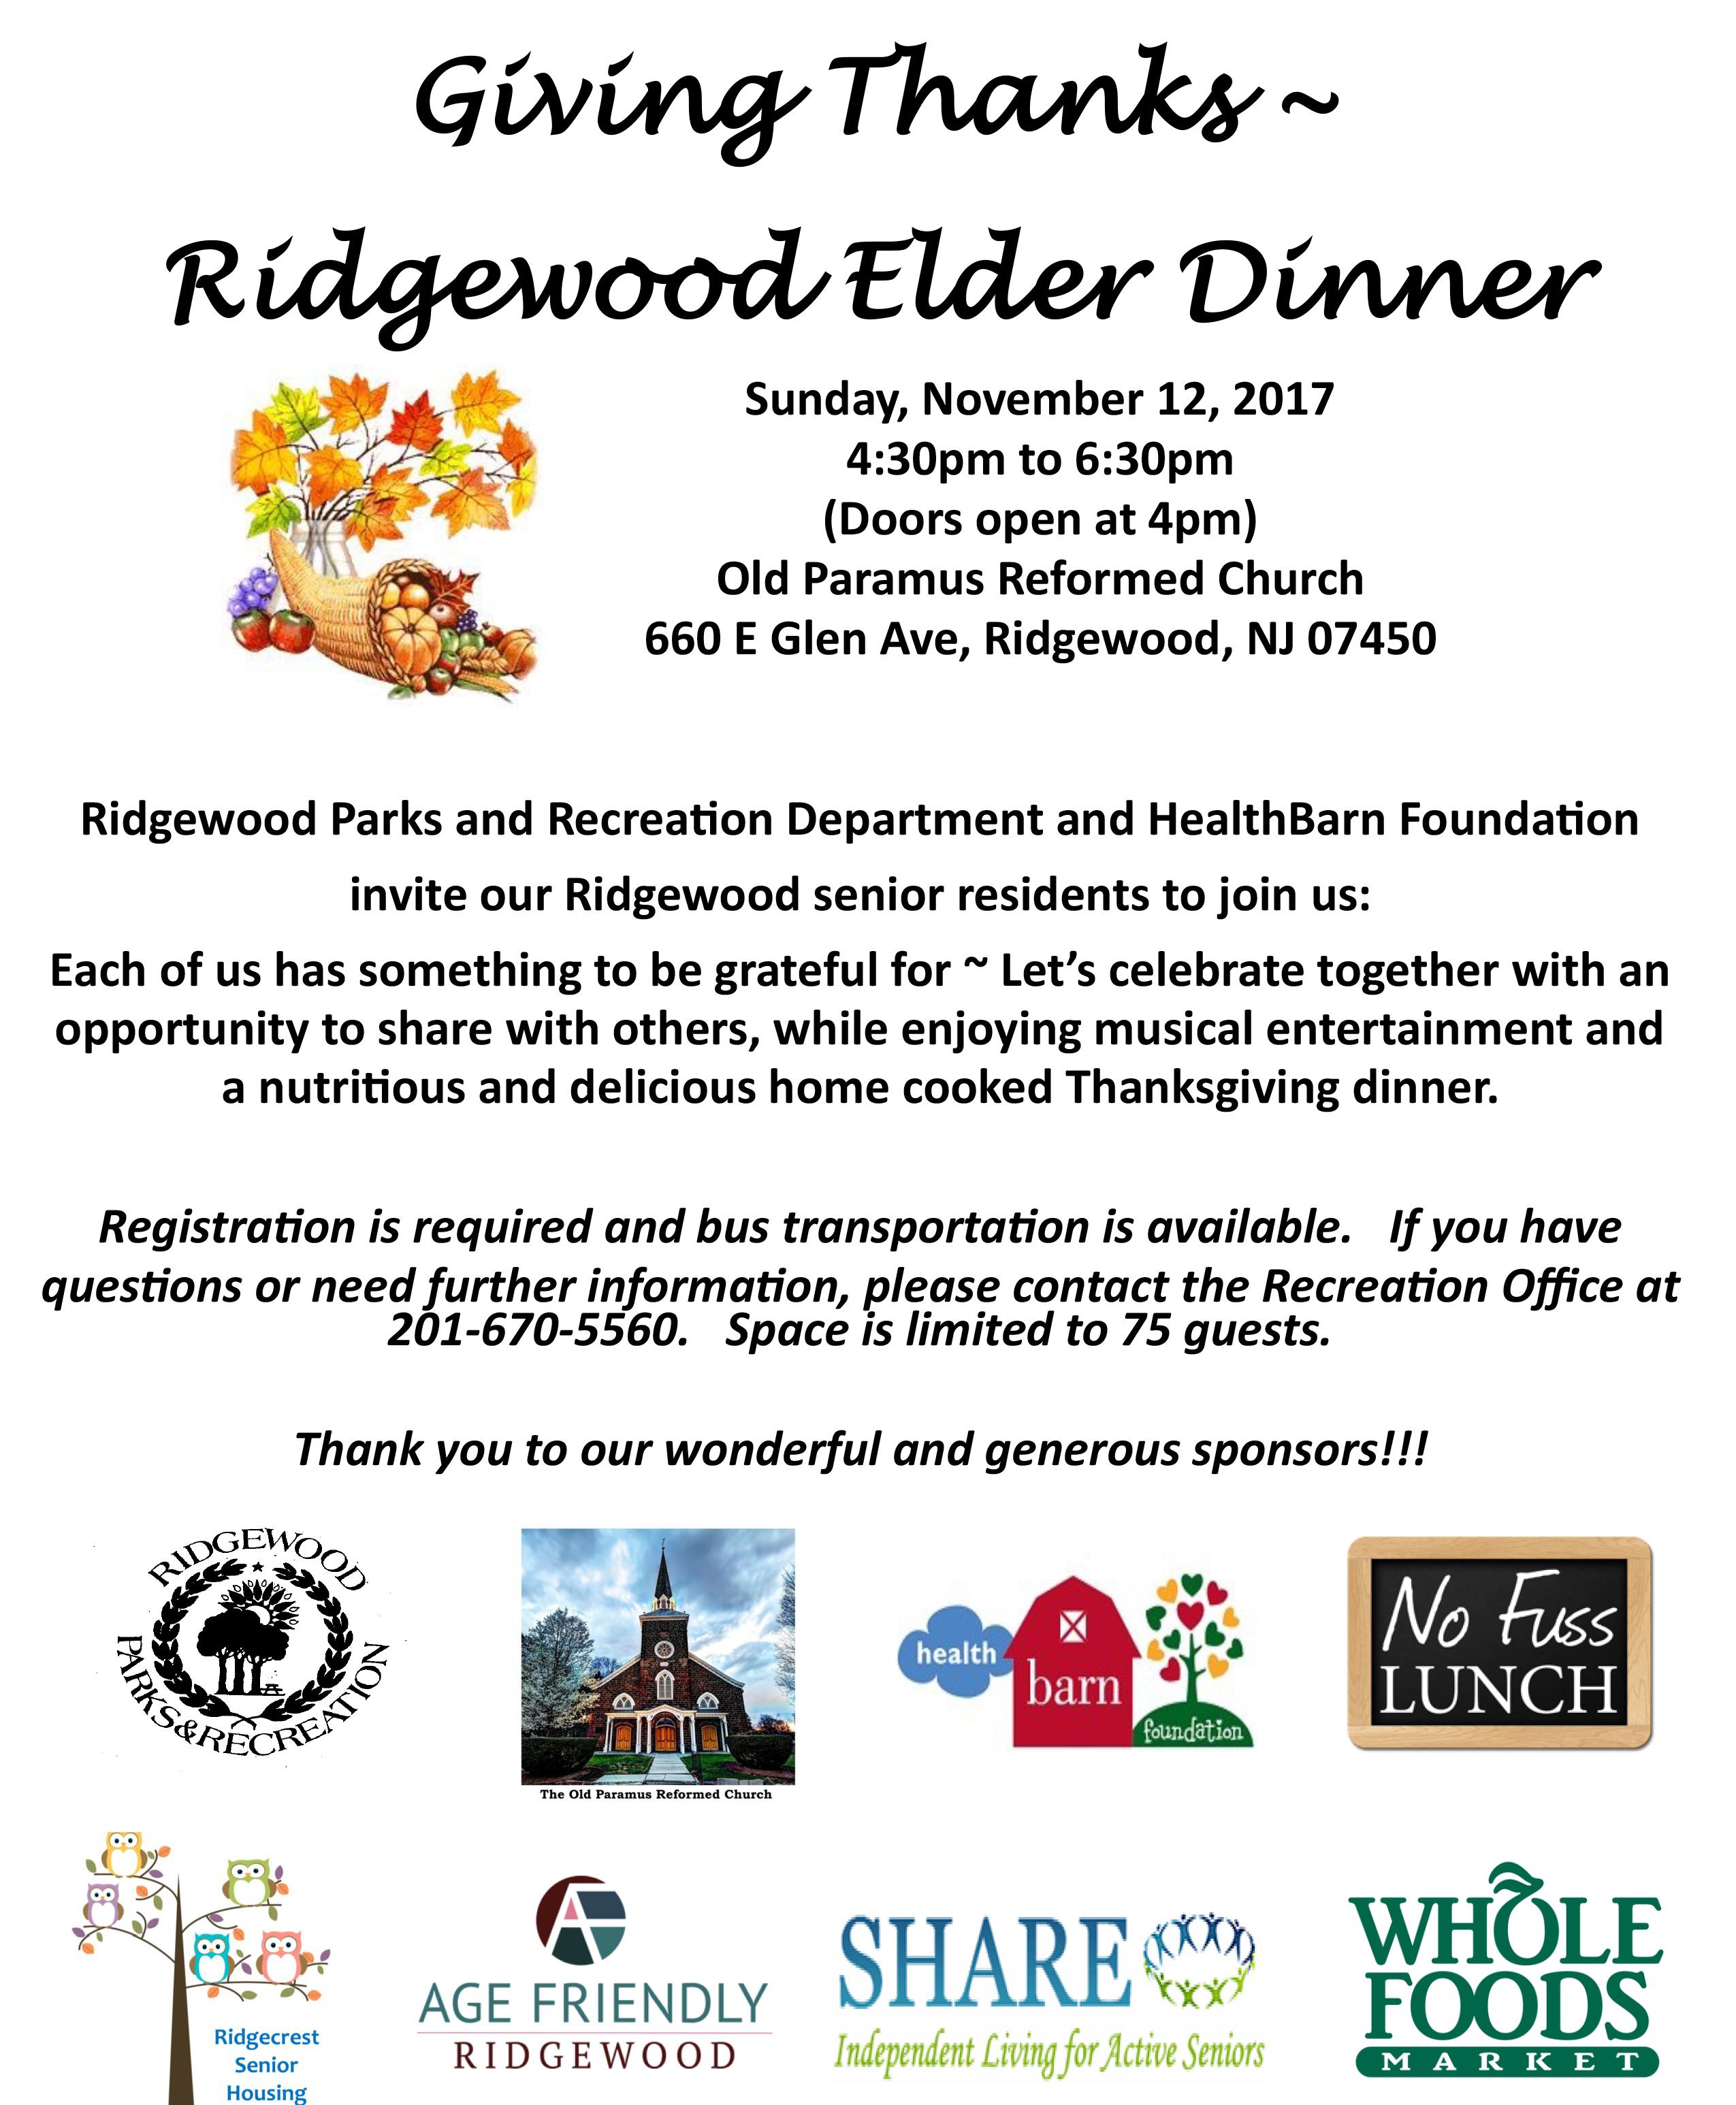 Giving Thanks - Ridgewood Elder Dinner - Age Friendly Ridgewood